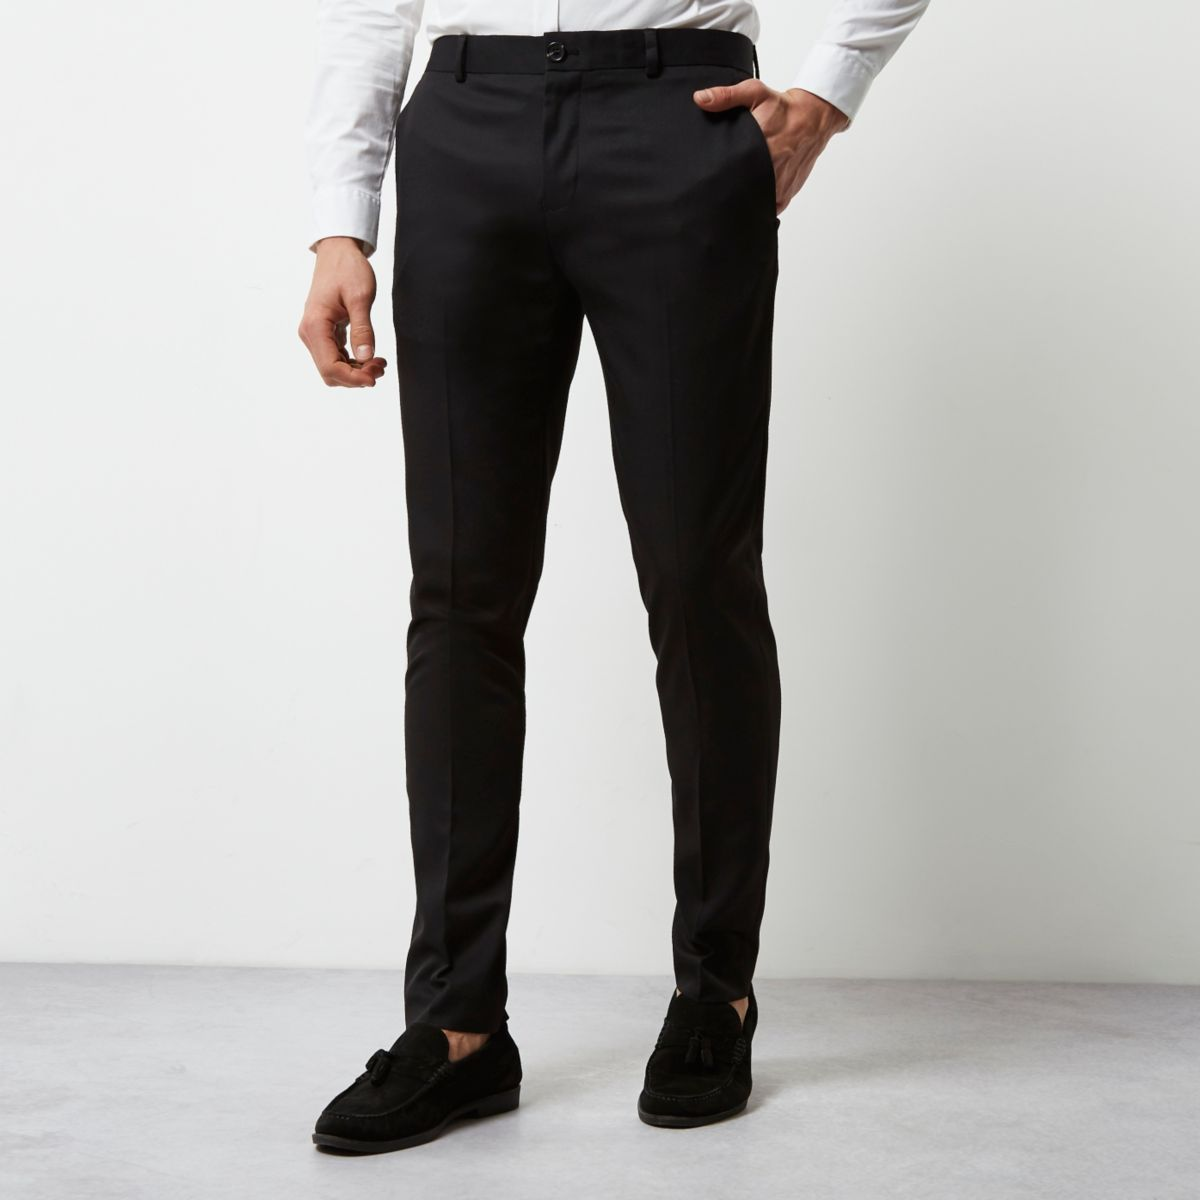 Black smart skinny fit pants